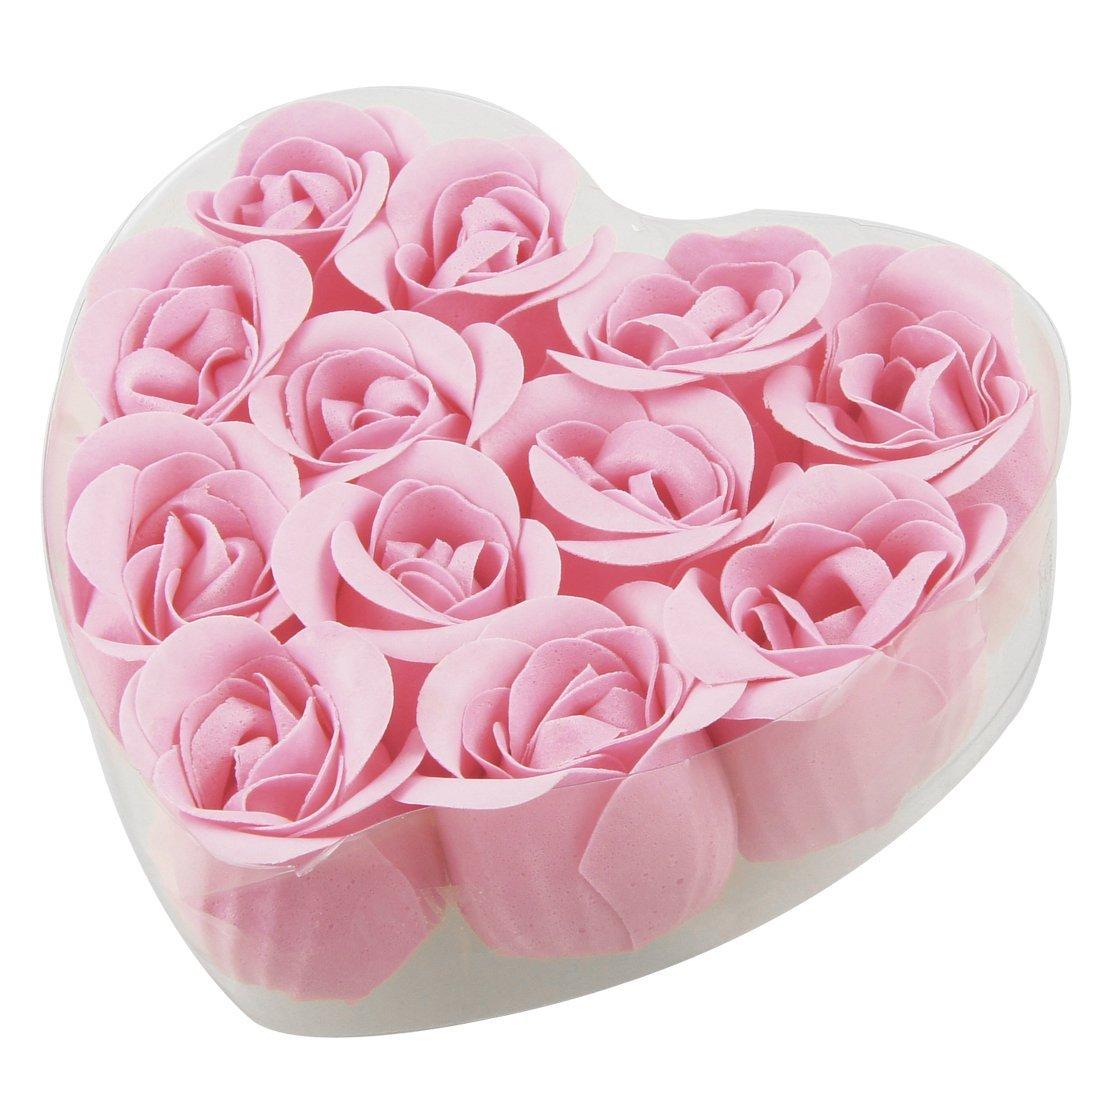 12 Pcs Bathing Pink Rose Bud Flower Petal Soap Heart Shape Box N3